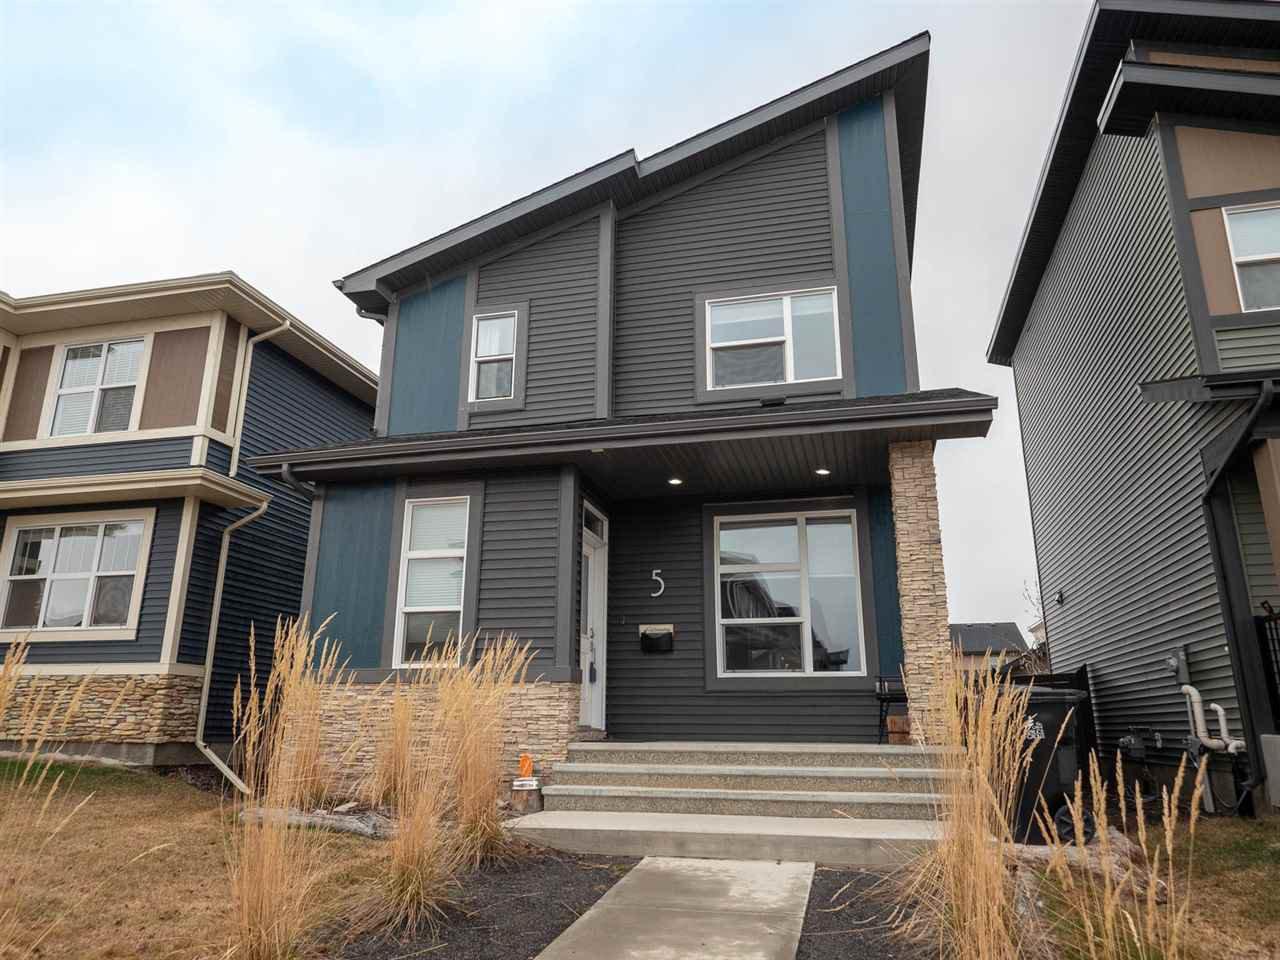 Main Photo: 5 KENSINGTON Close: Spruce Grove House for sale : MLS®# E4152916